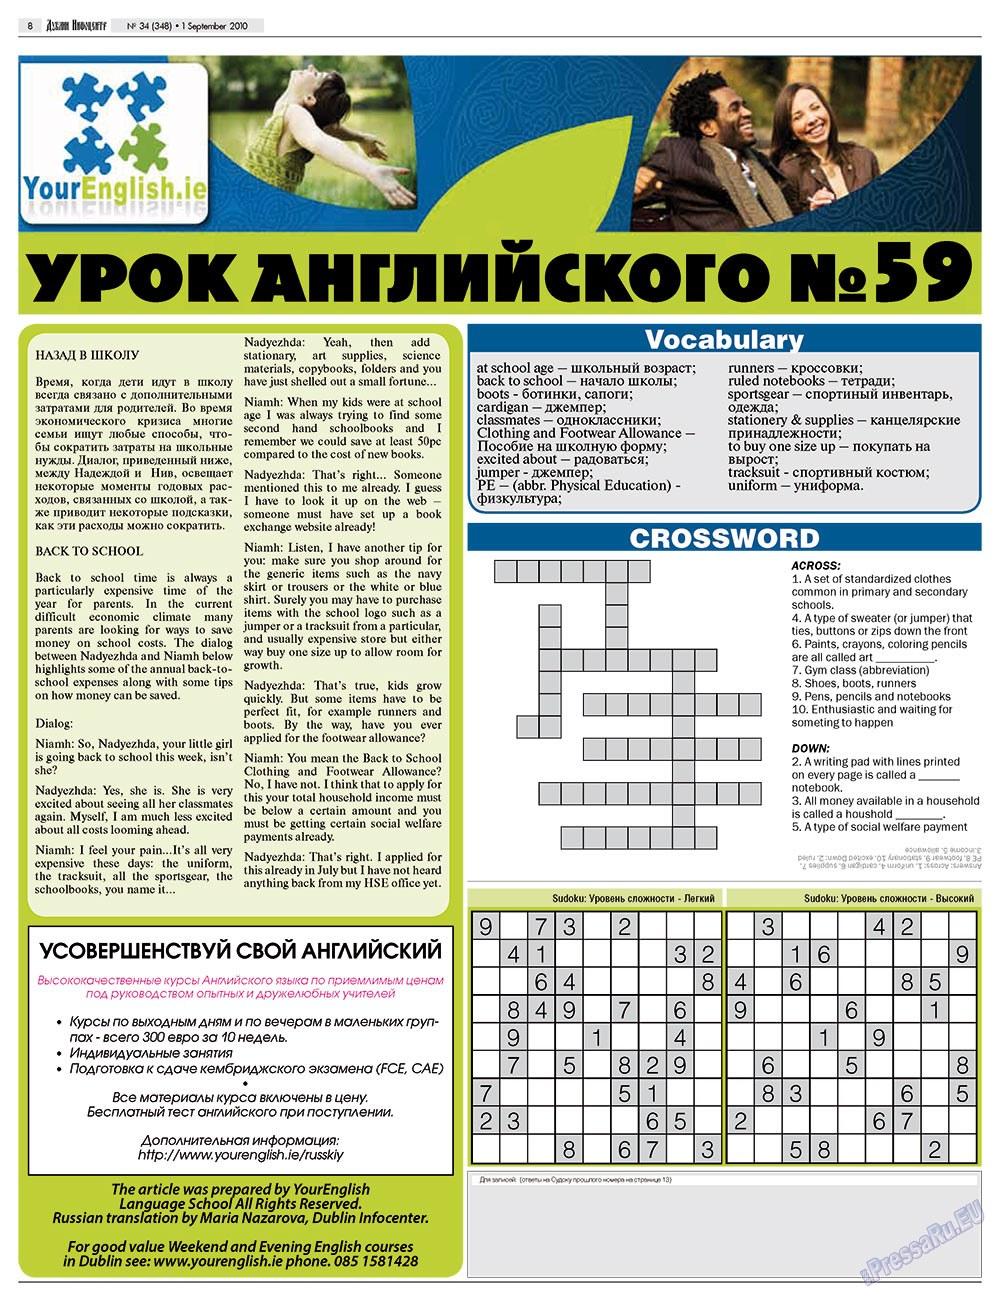 Дублин инфоцентр (газета). 2010 год, номер 34, стр. 8